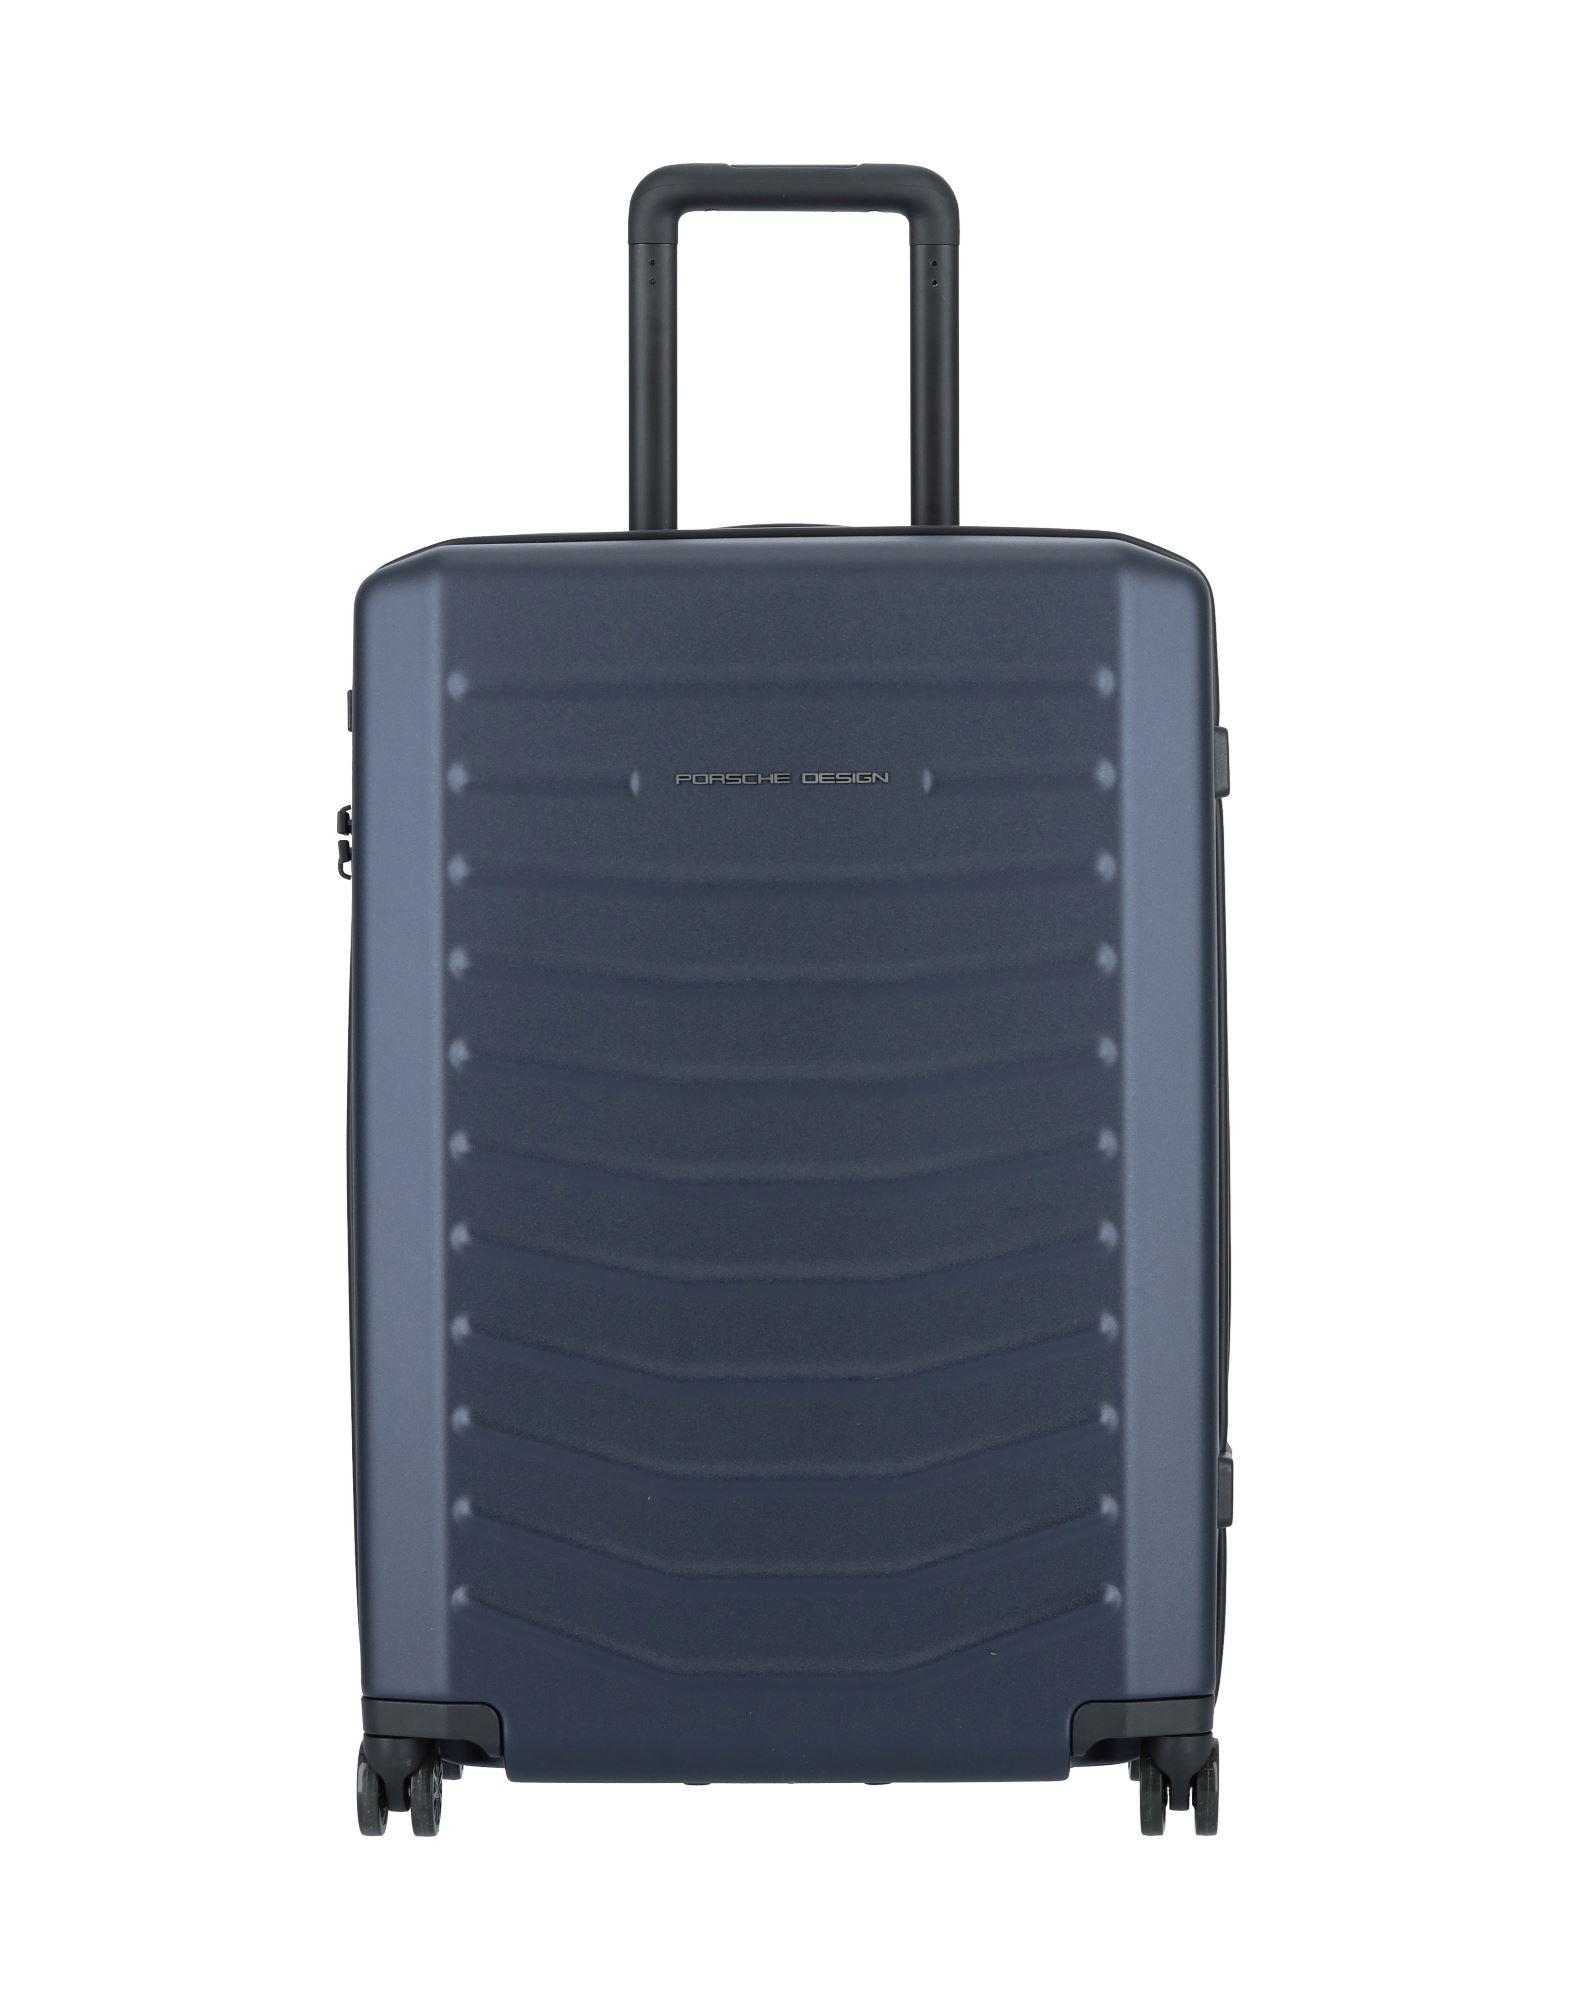 PORSCHE DESIGN Unisex スーツケース ダークブルー